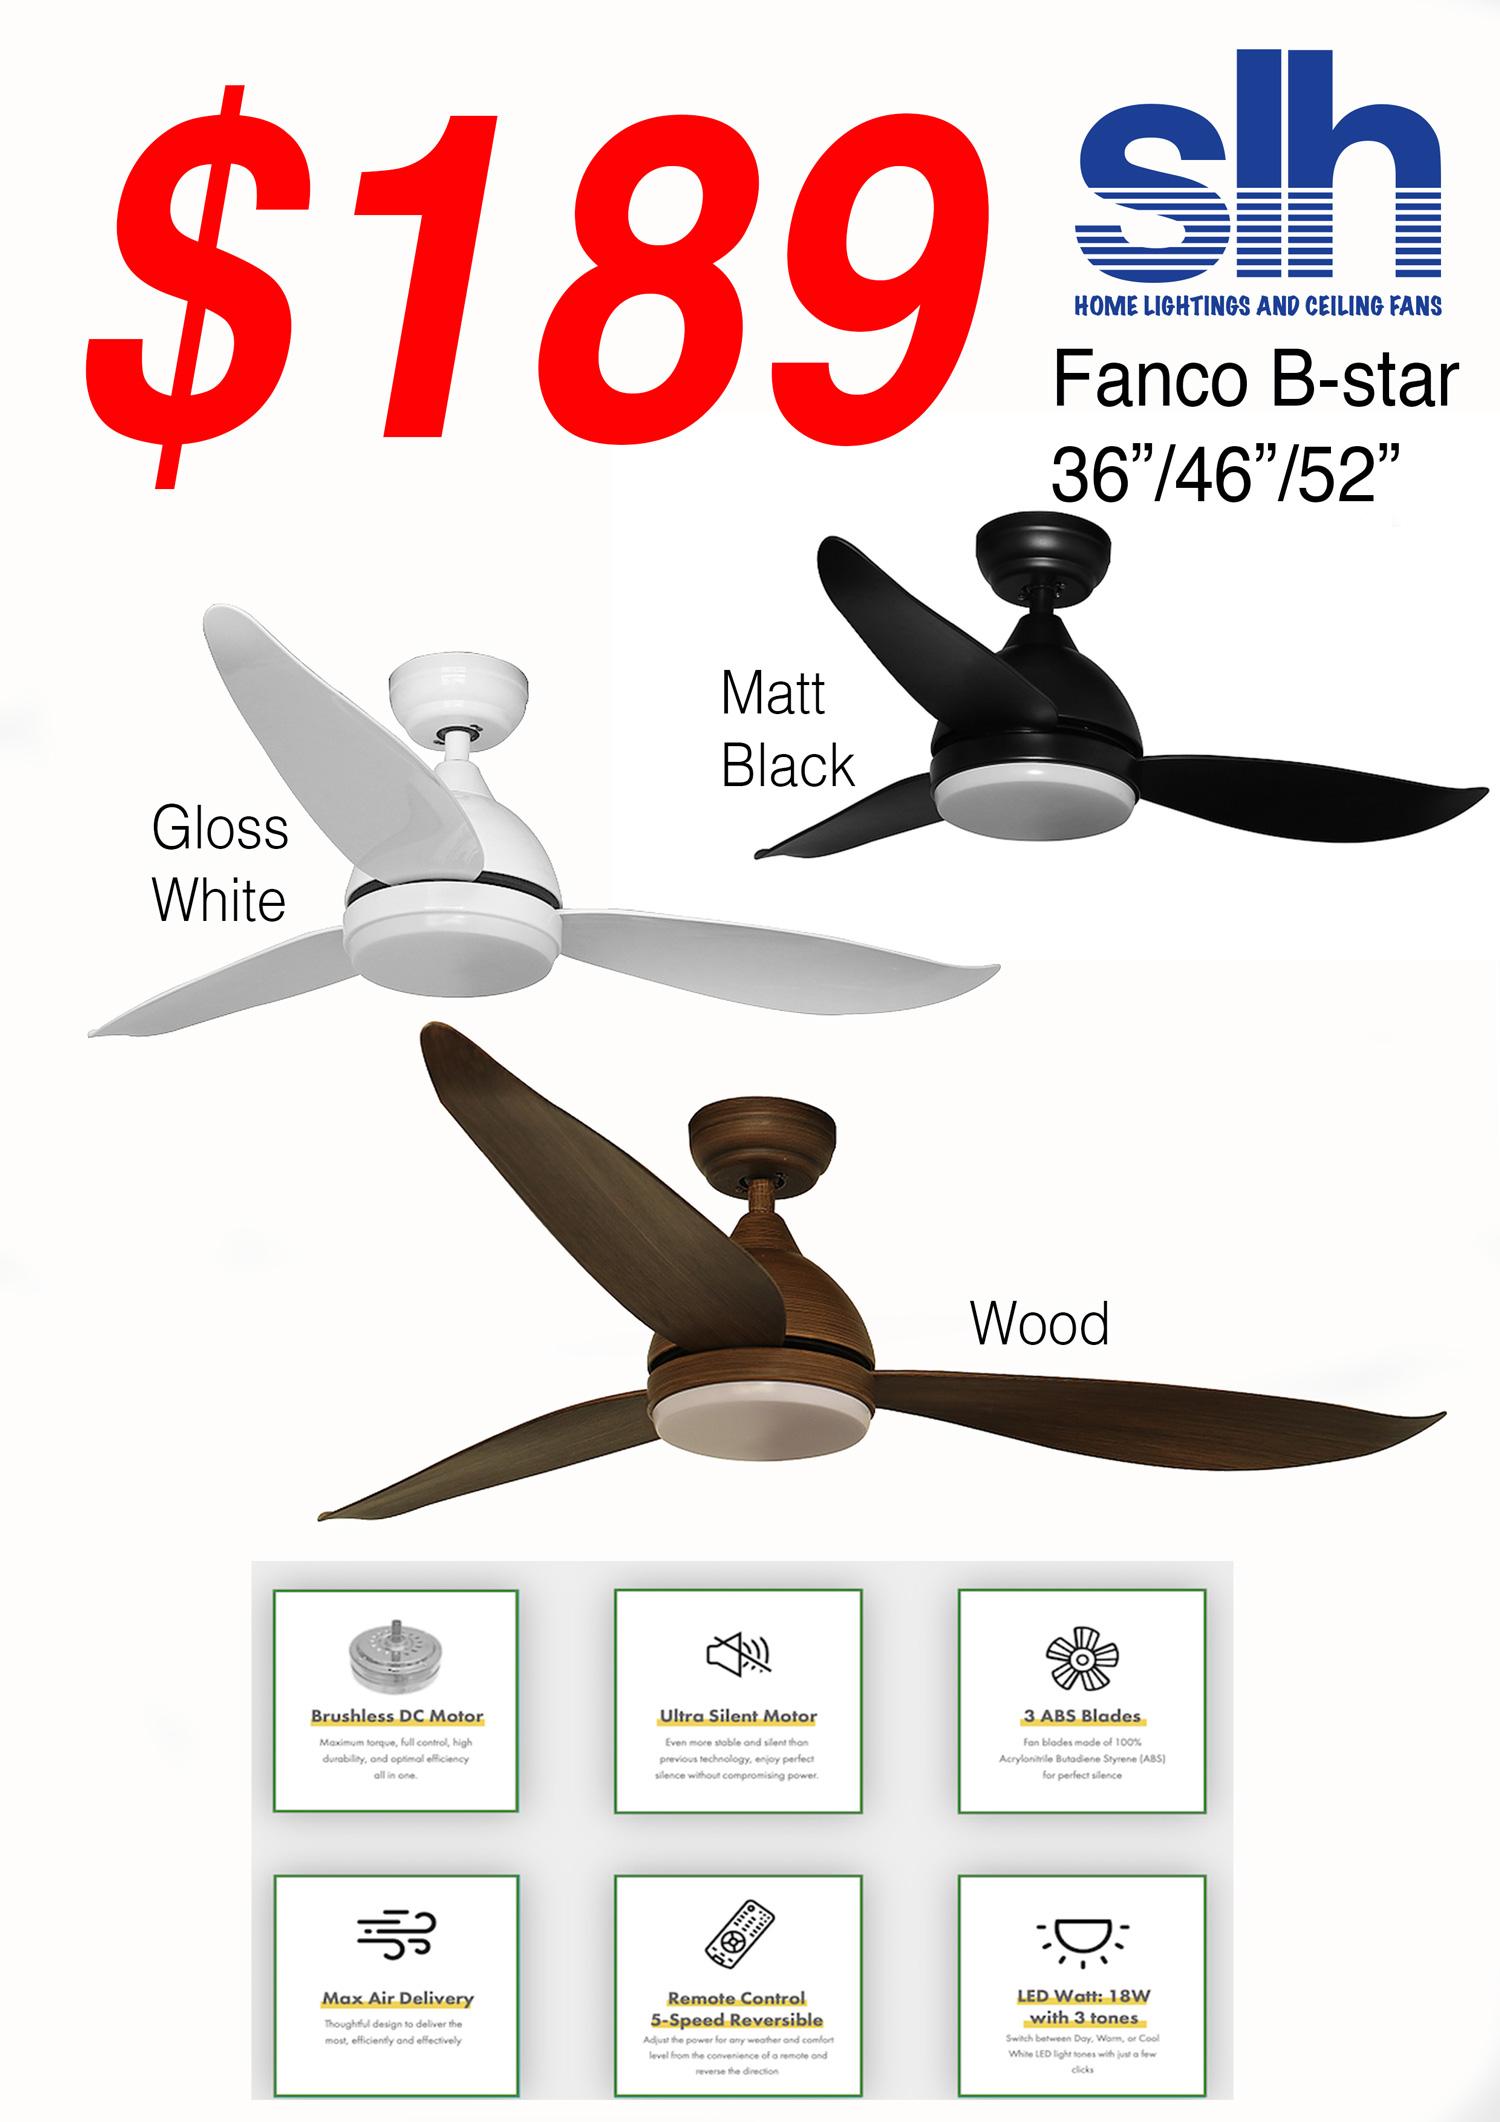 brochure-fanco-bstar-ceiling-fan-sembawang-lighting-house.jpg